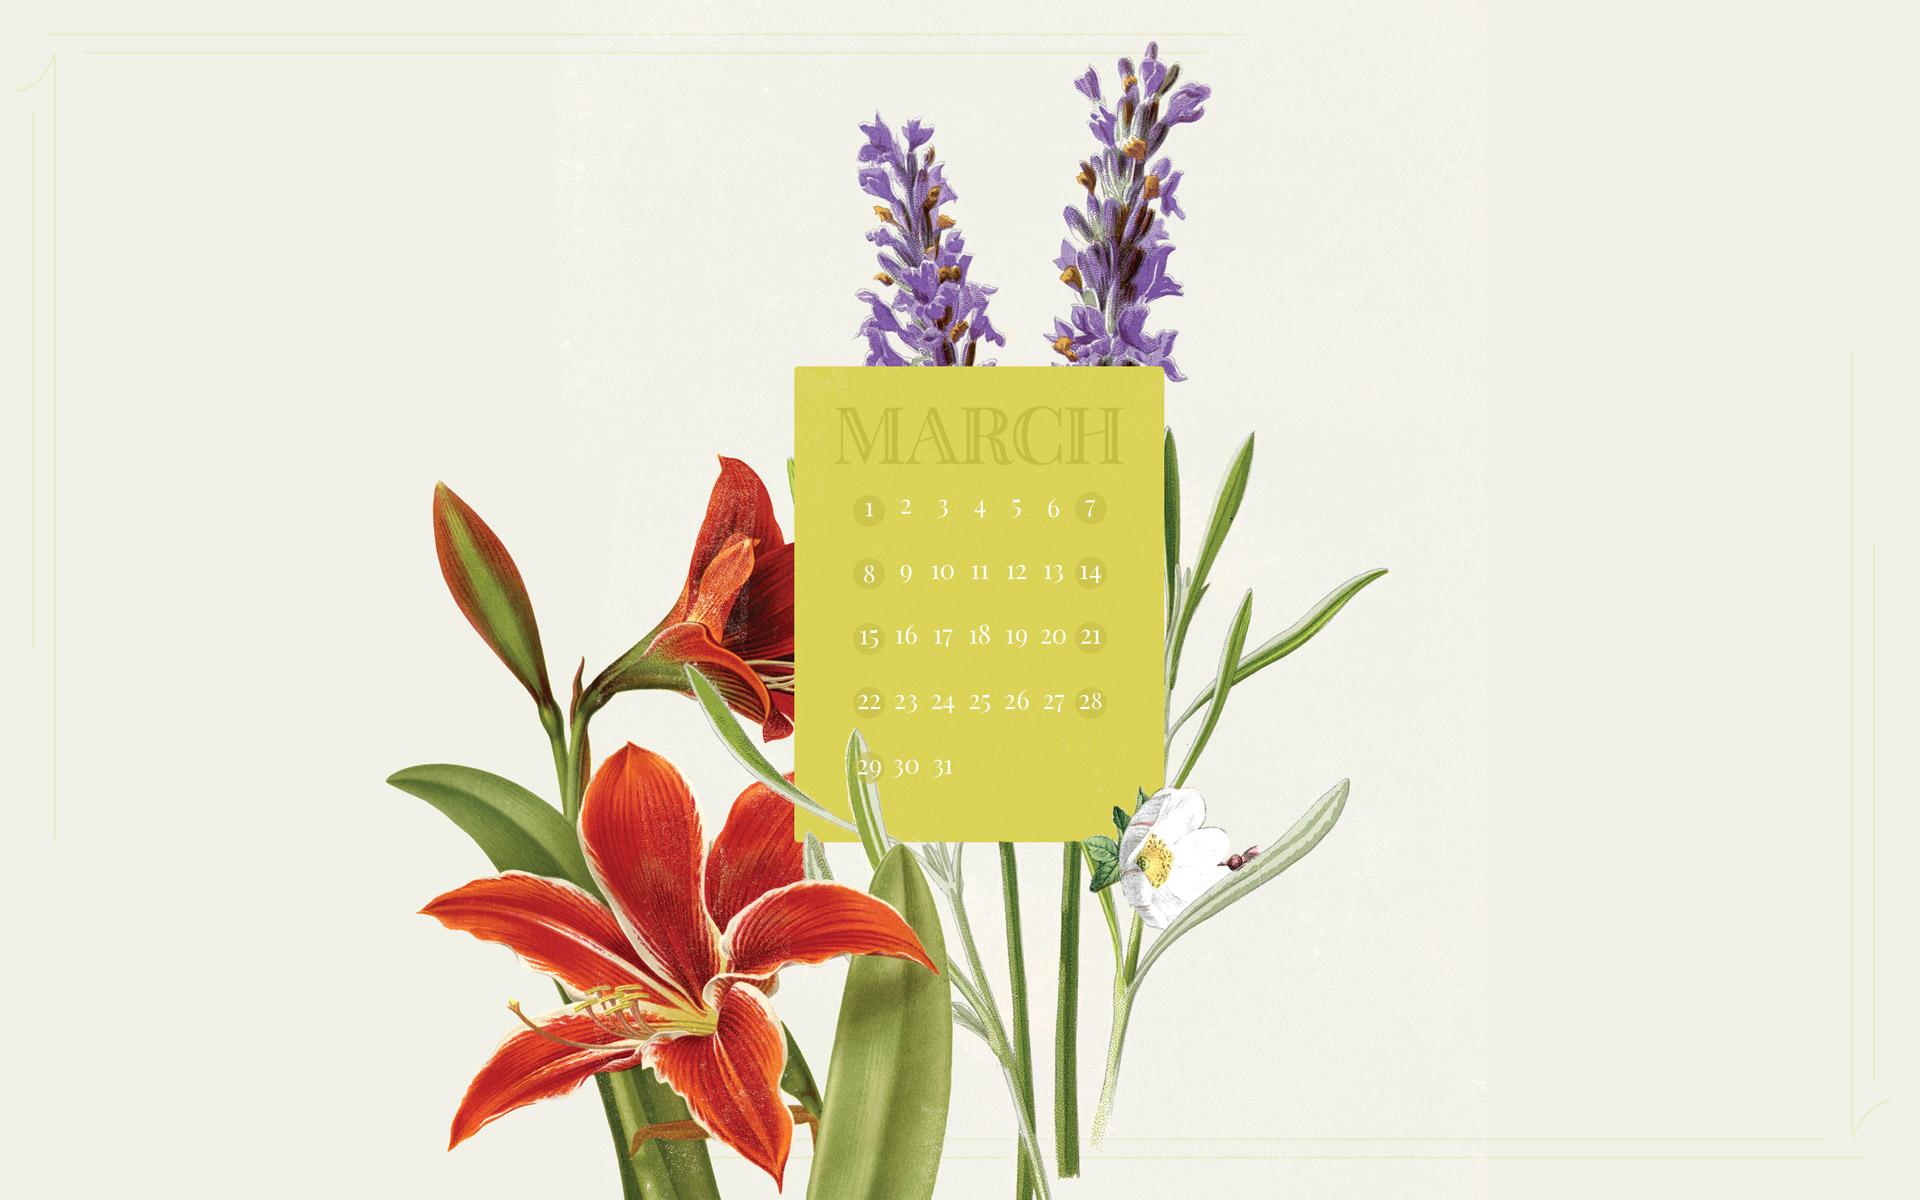 March 2015 Desktop Calendar Wallpaper Paper Leaf 1920x1200